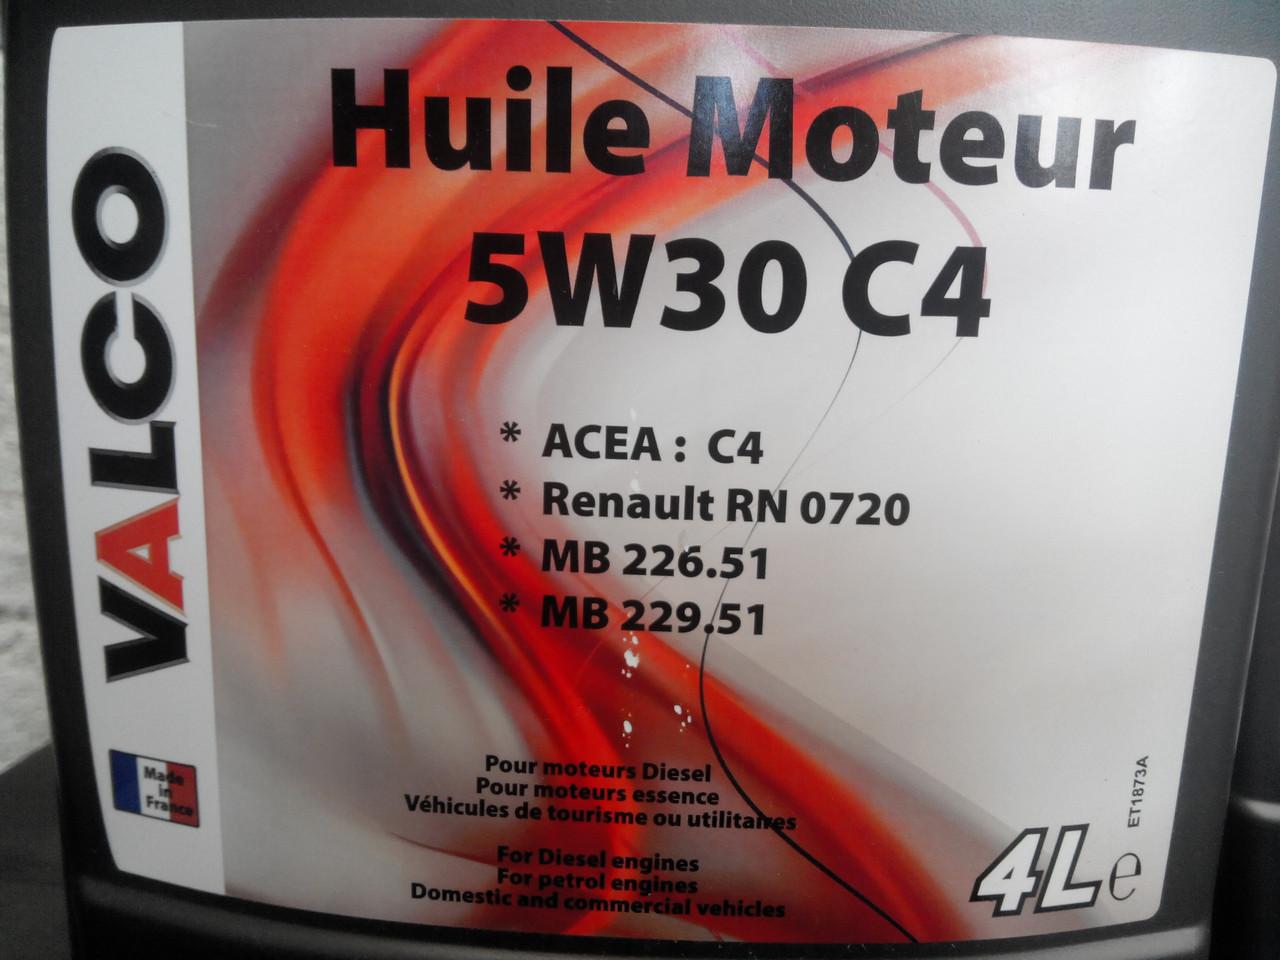 Синтетическое моторное масло Valco Huile Moteur 5w-30 C4